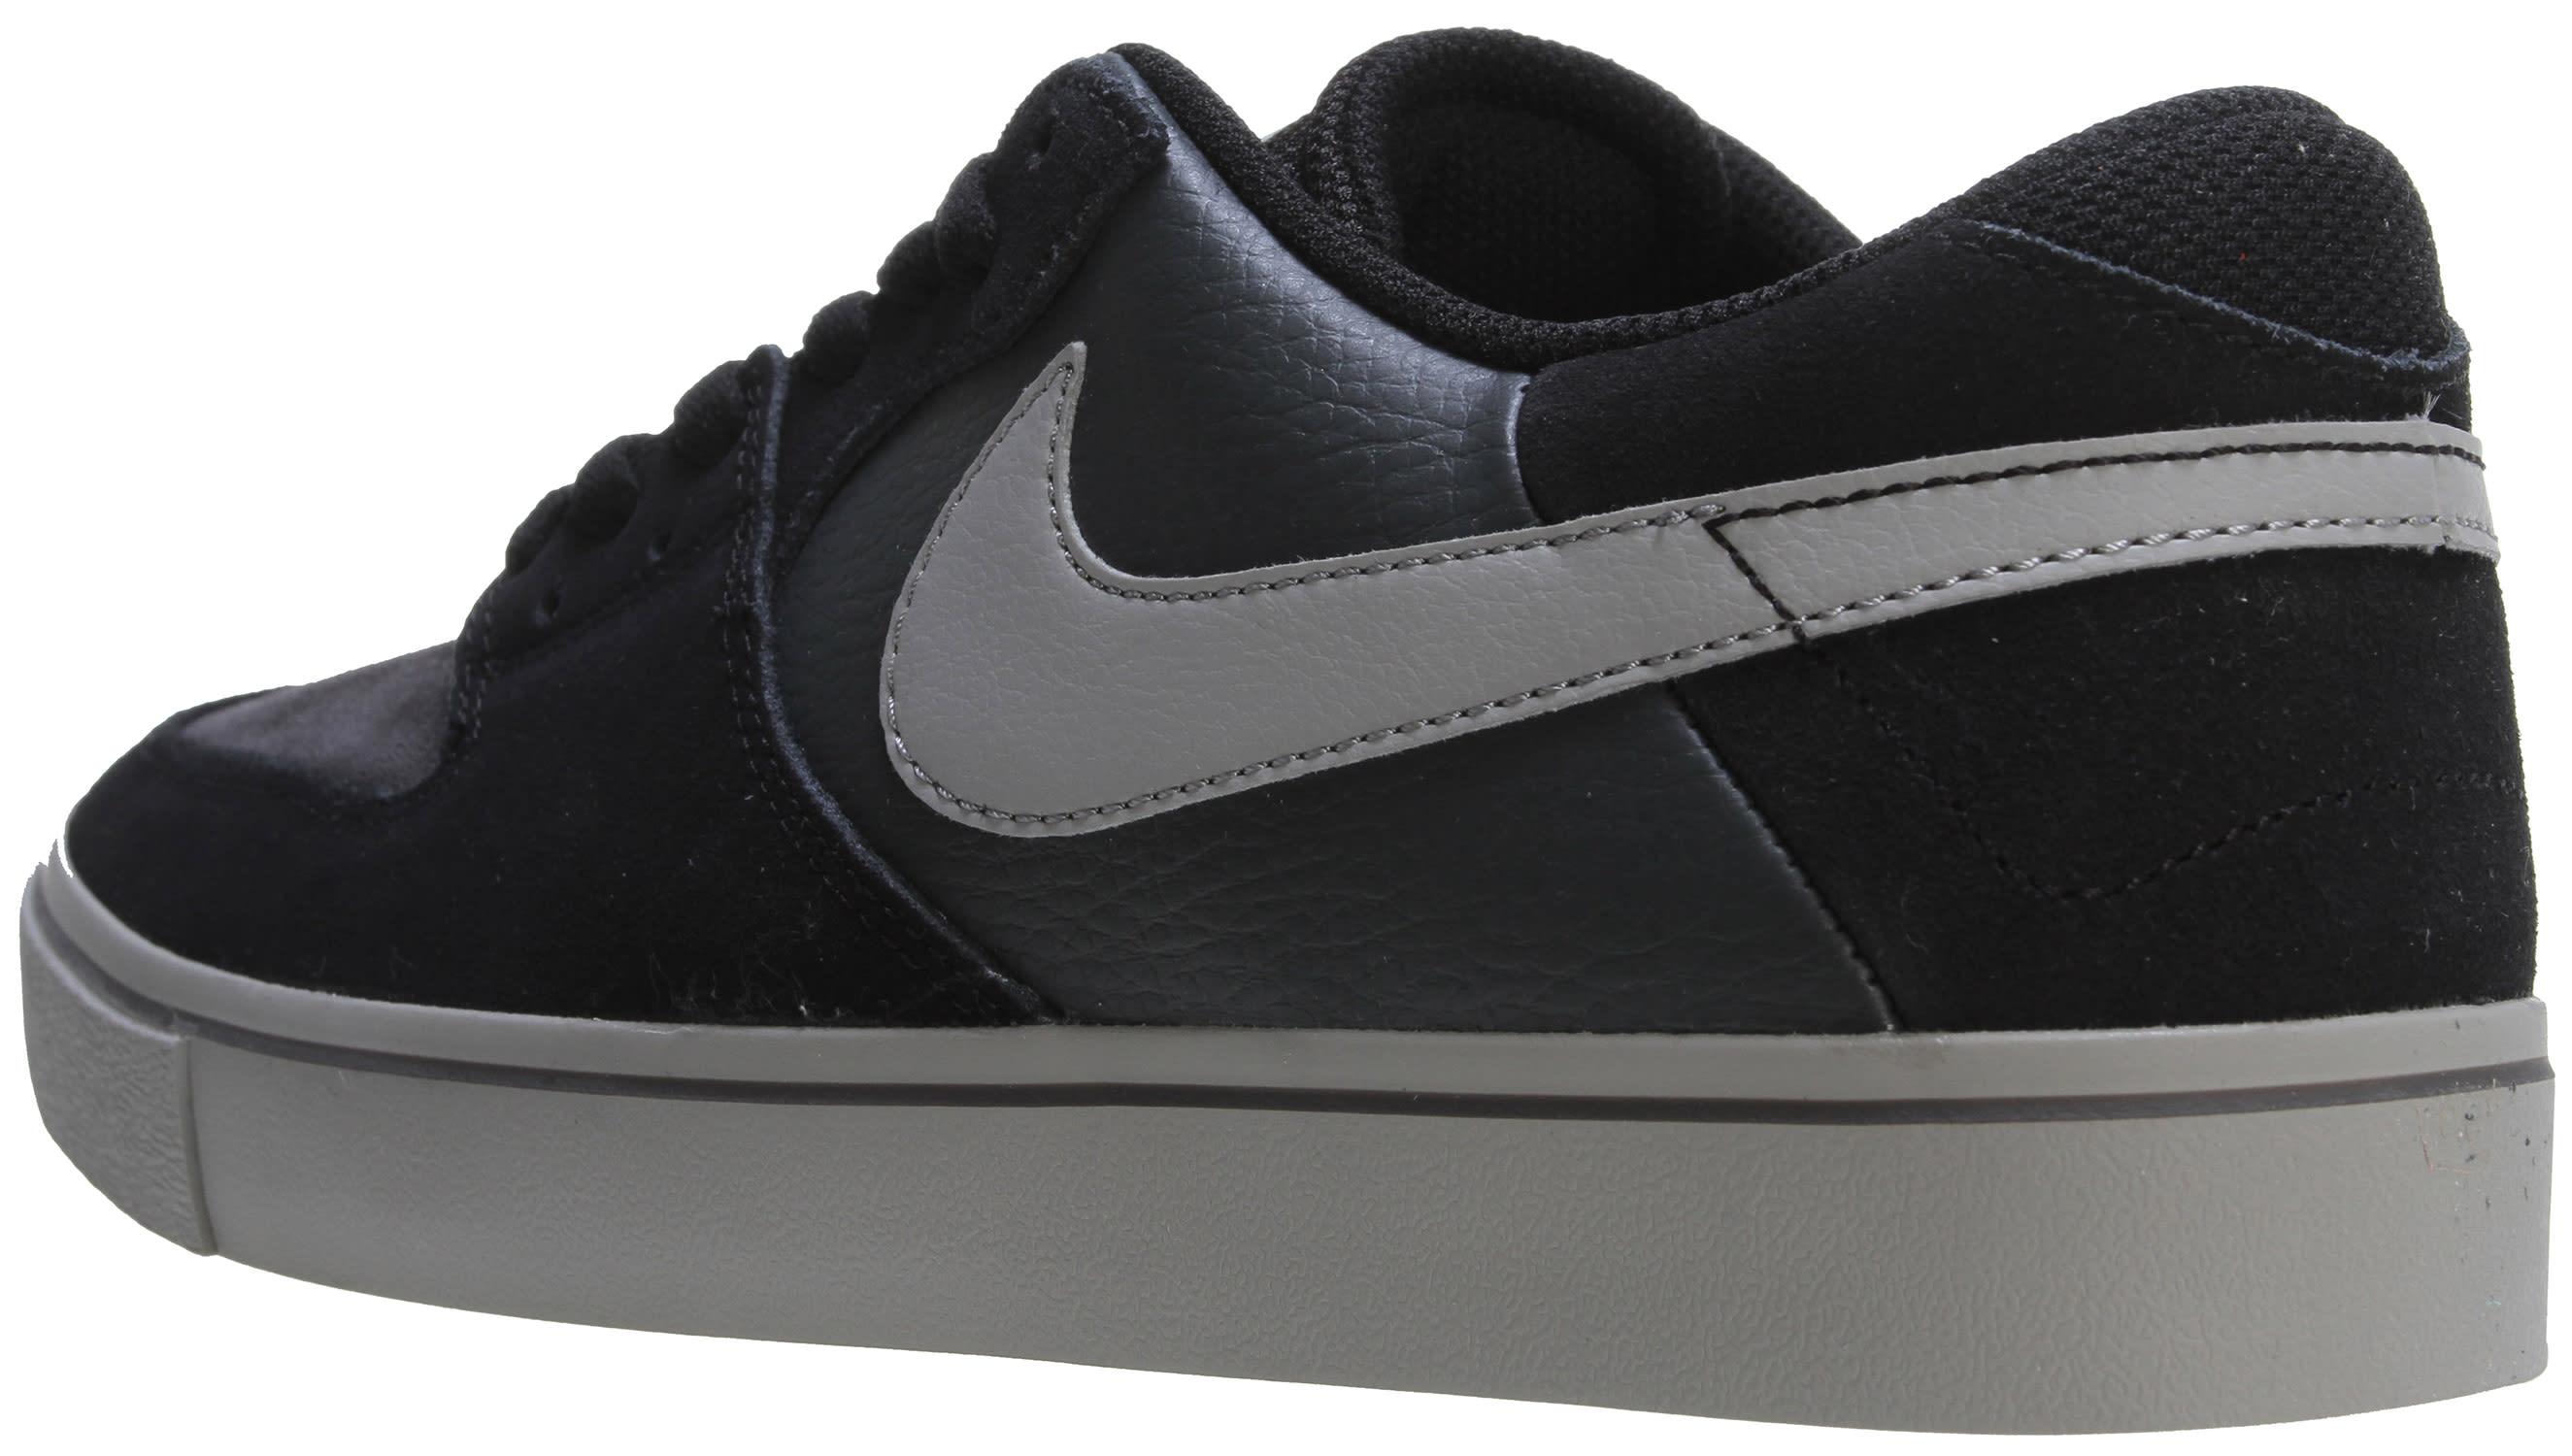 new arrival 49434 b7945 nike sb paul rodriguez 7 lunarlon shoes Nike SB Trainerendor Shoes BlackBlack  Dark Grey ...